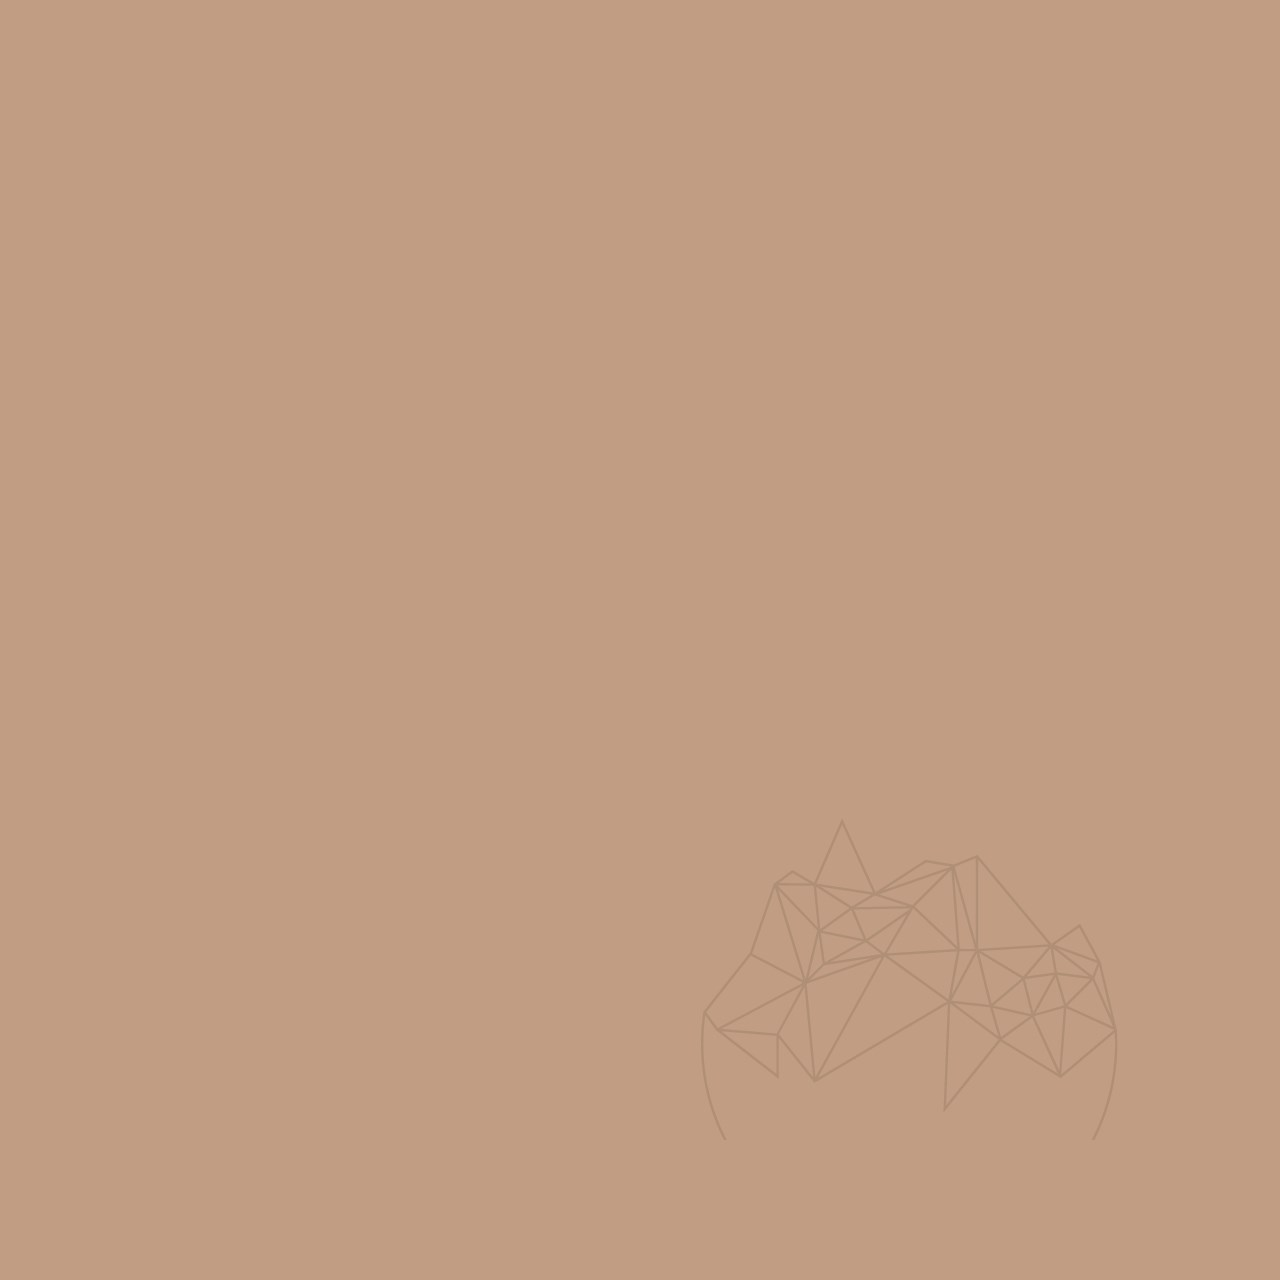 Weber Color Perfect Terracota 2 KG - Flexible wall & floor grout title=Weber Color Perfect Terracota 2 KG - Flexible wall & floor grout